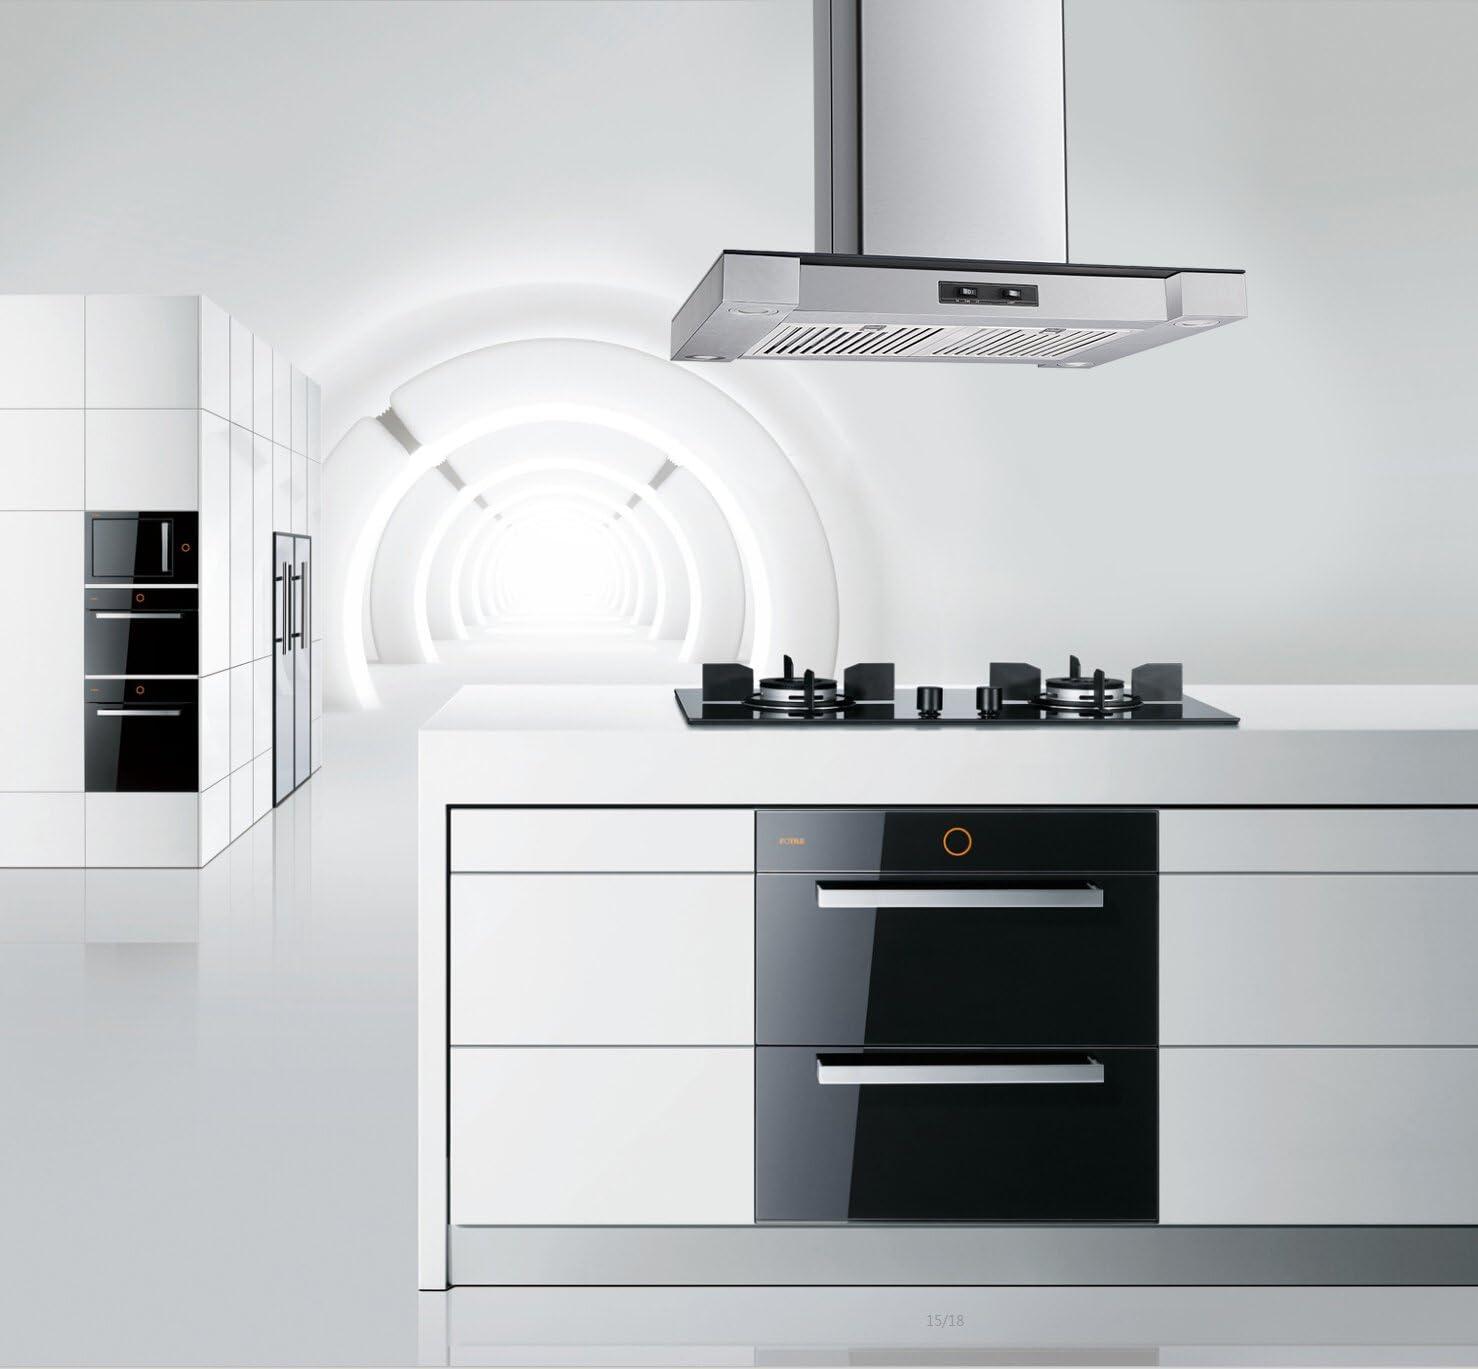 ghdonat.com Appliances Range Hoods BQLZR Range Hoods Plastic Round ...